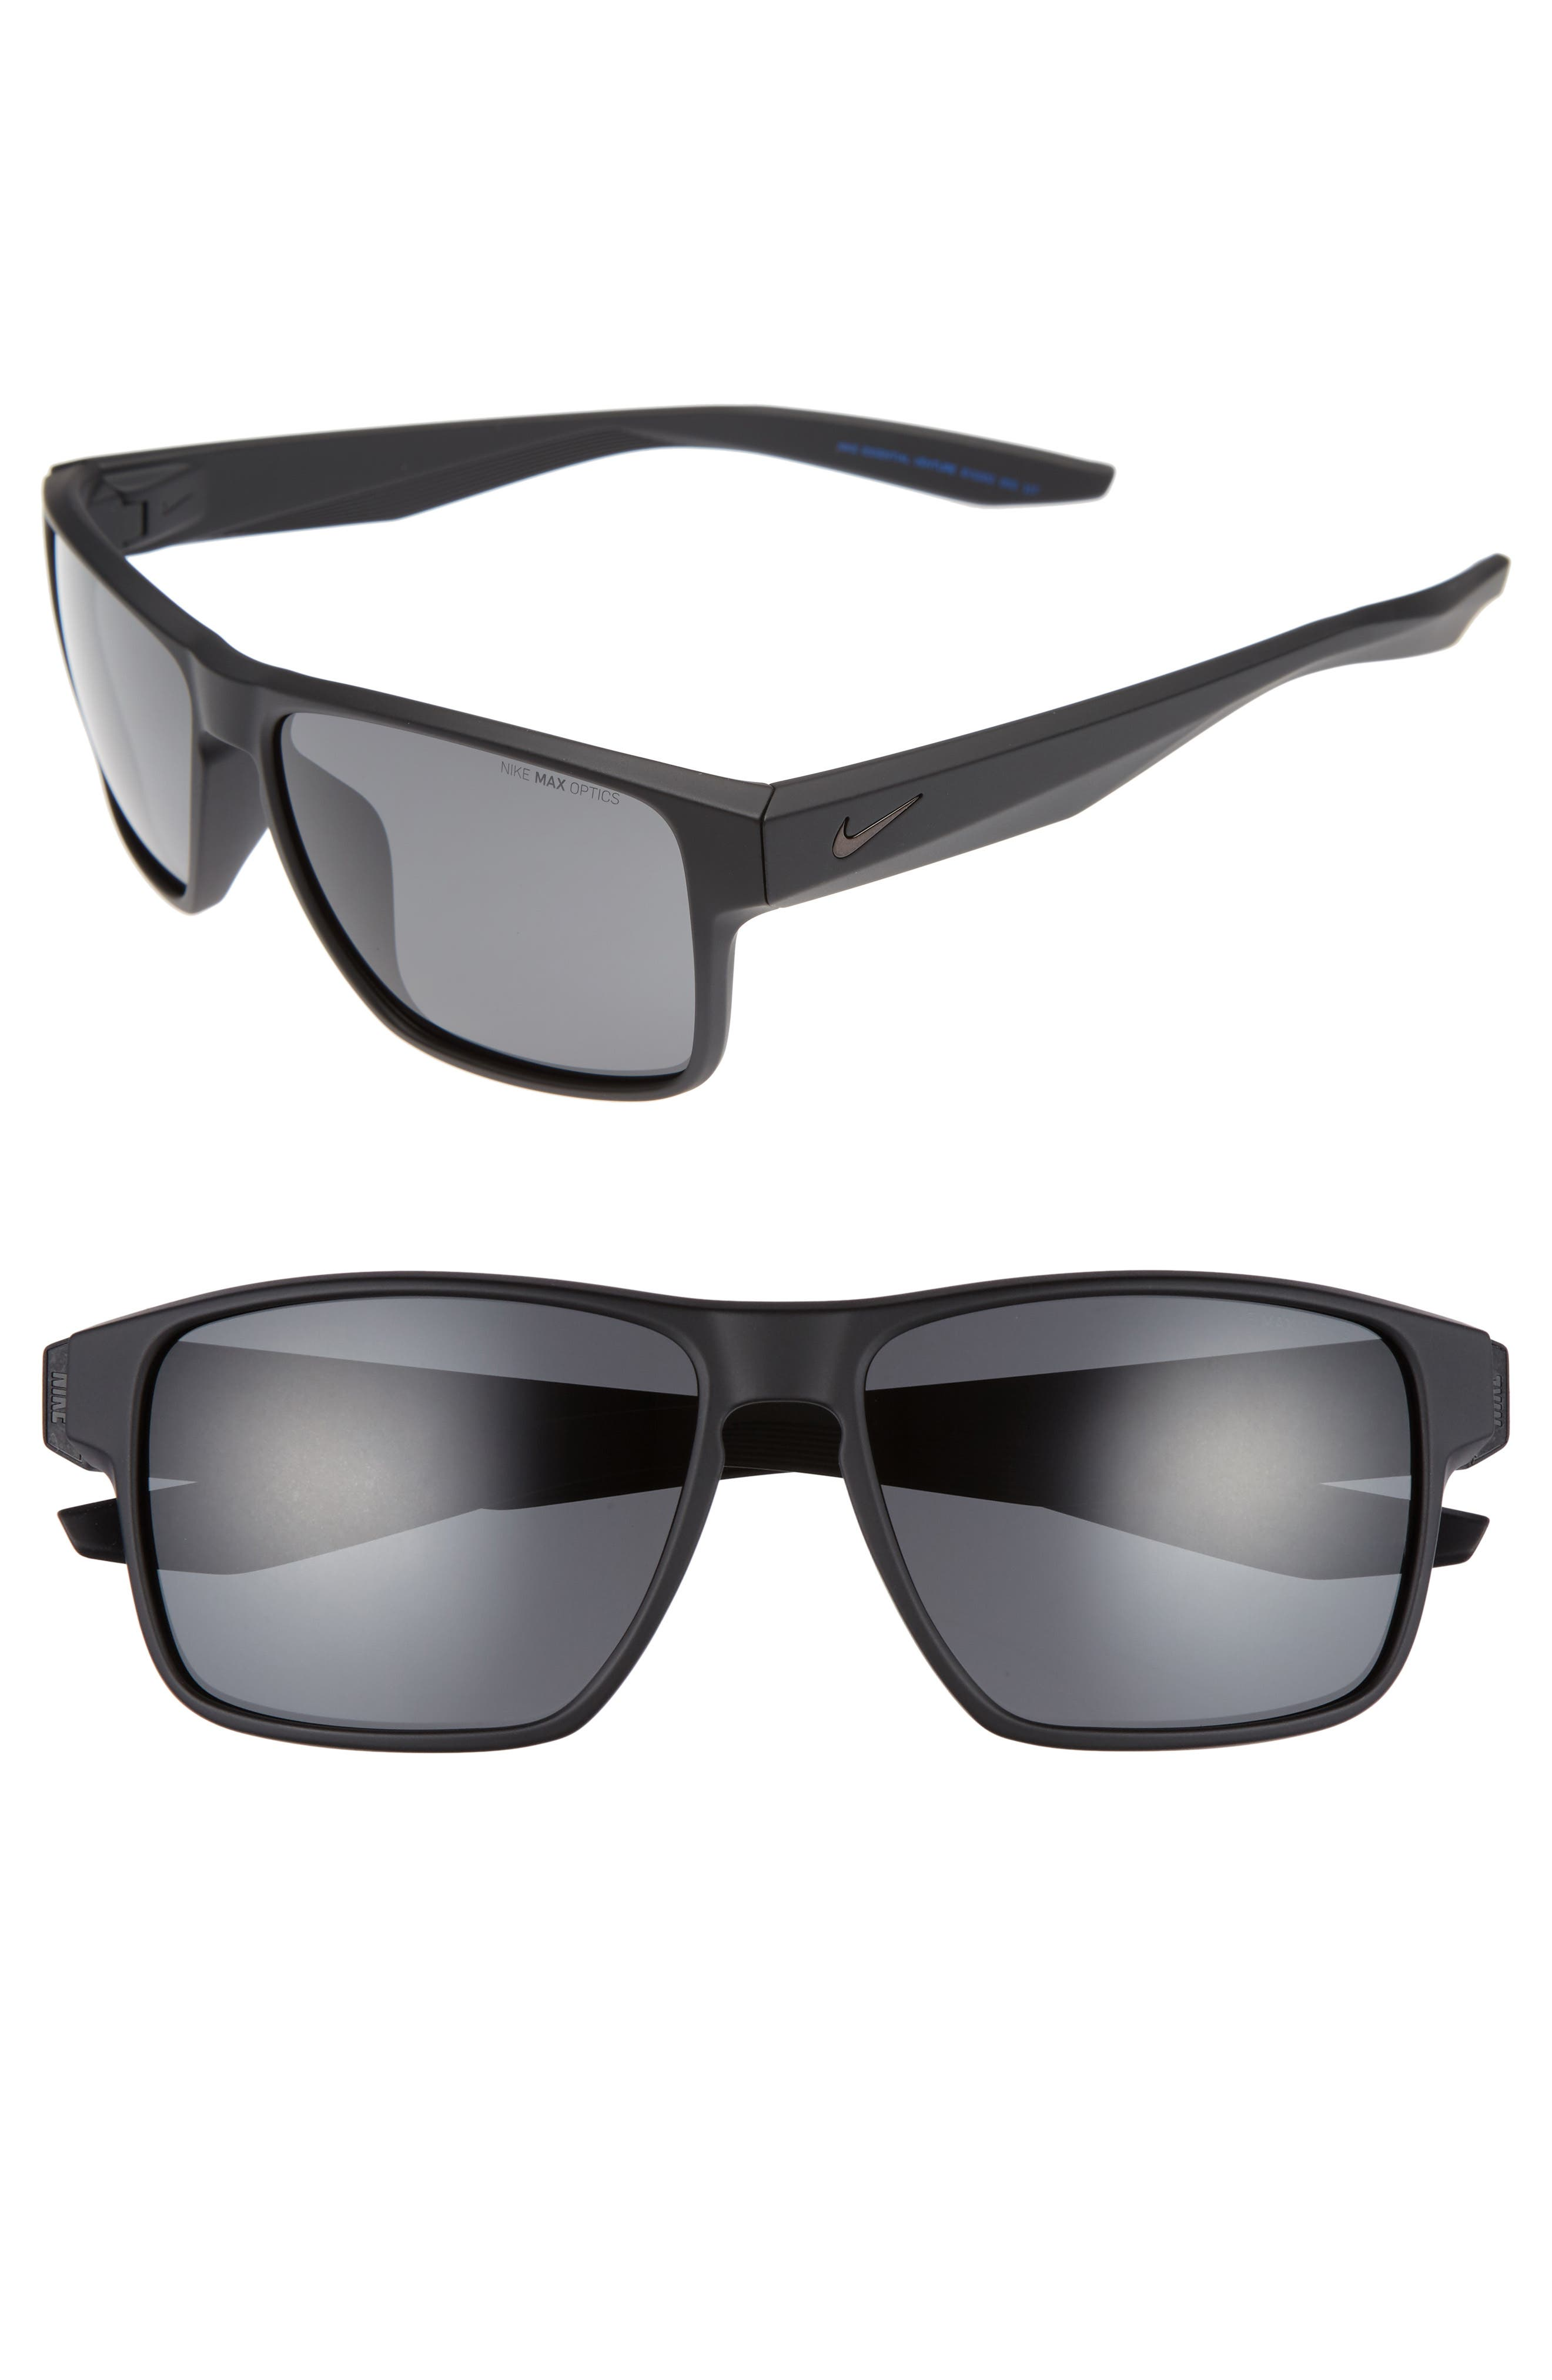 Nike Essential Venture 5m Sunglasses - Matte Black